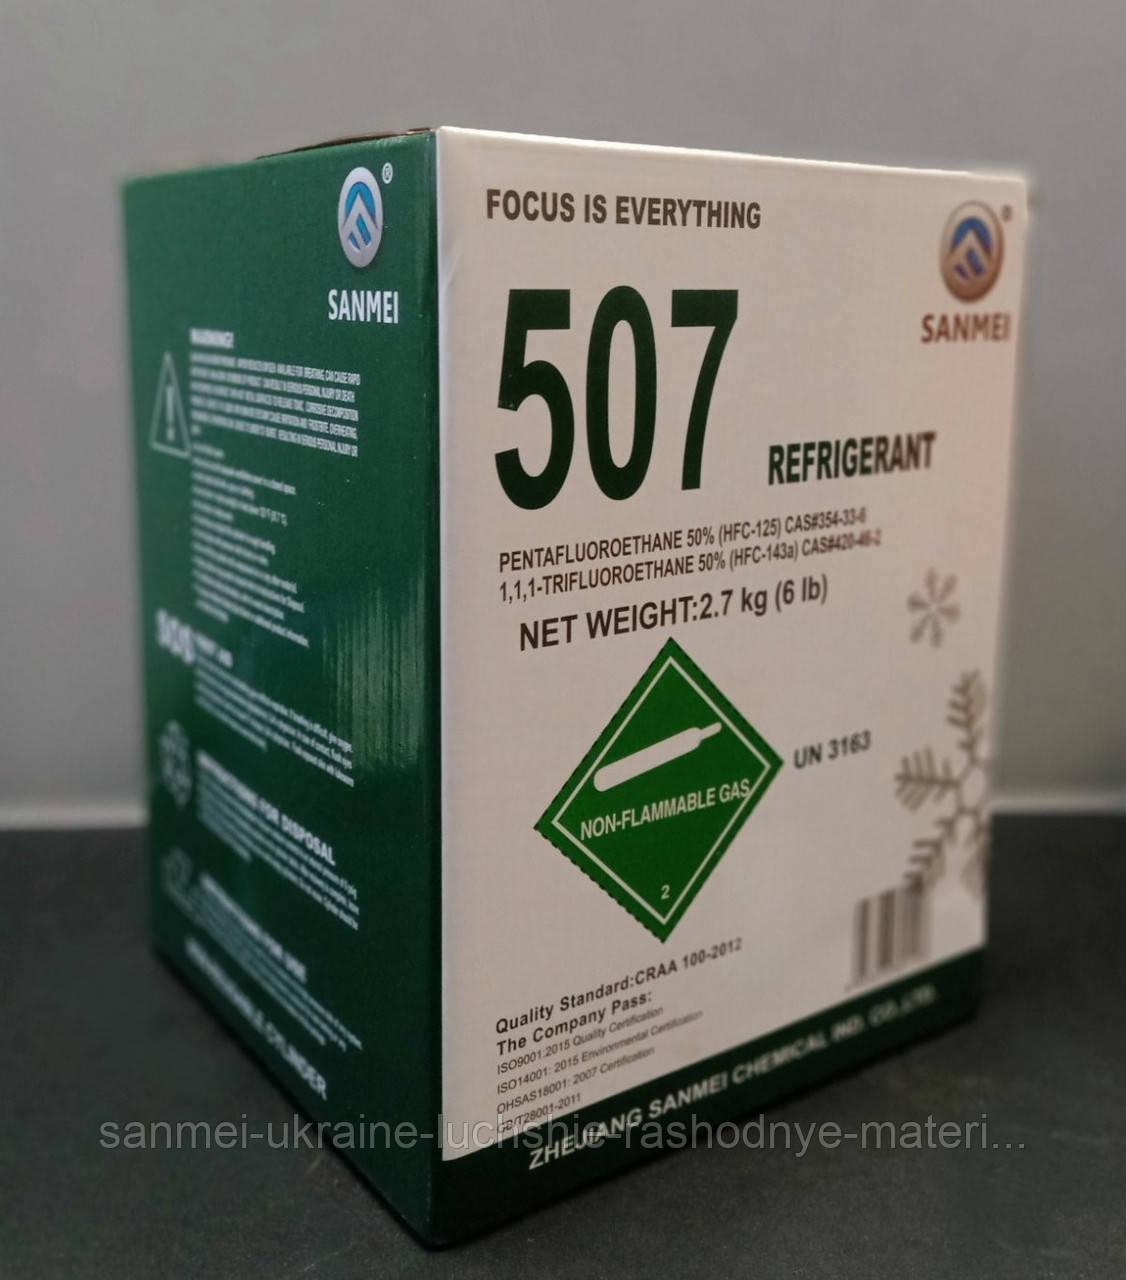 Фреон R507,  2.7 кг, SANMEI